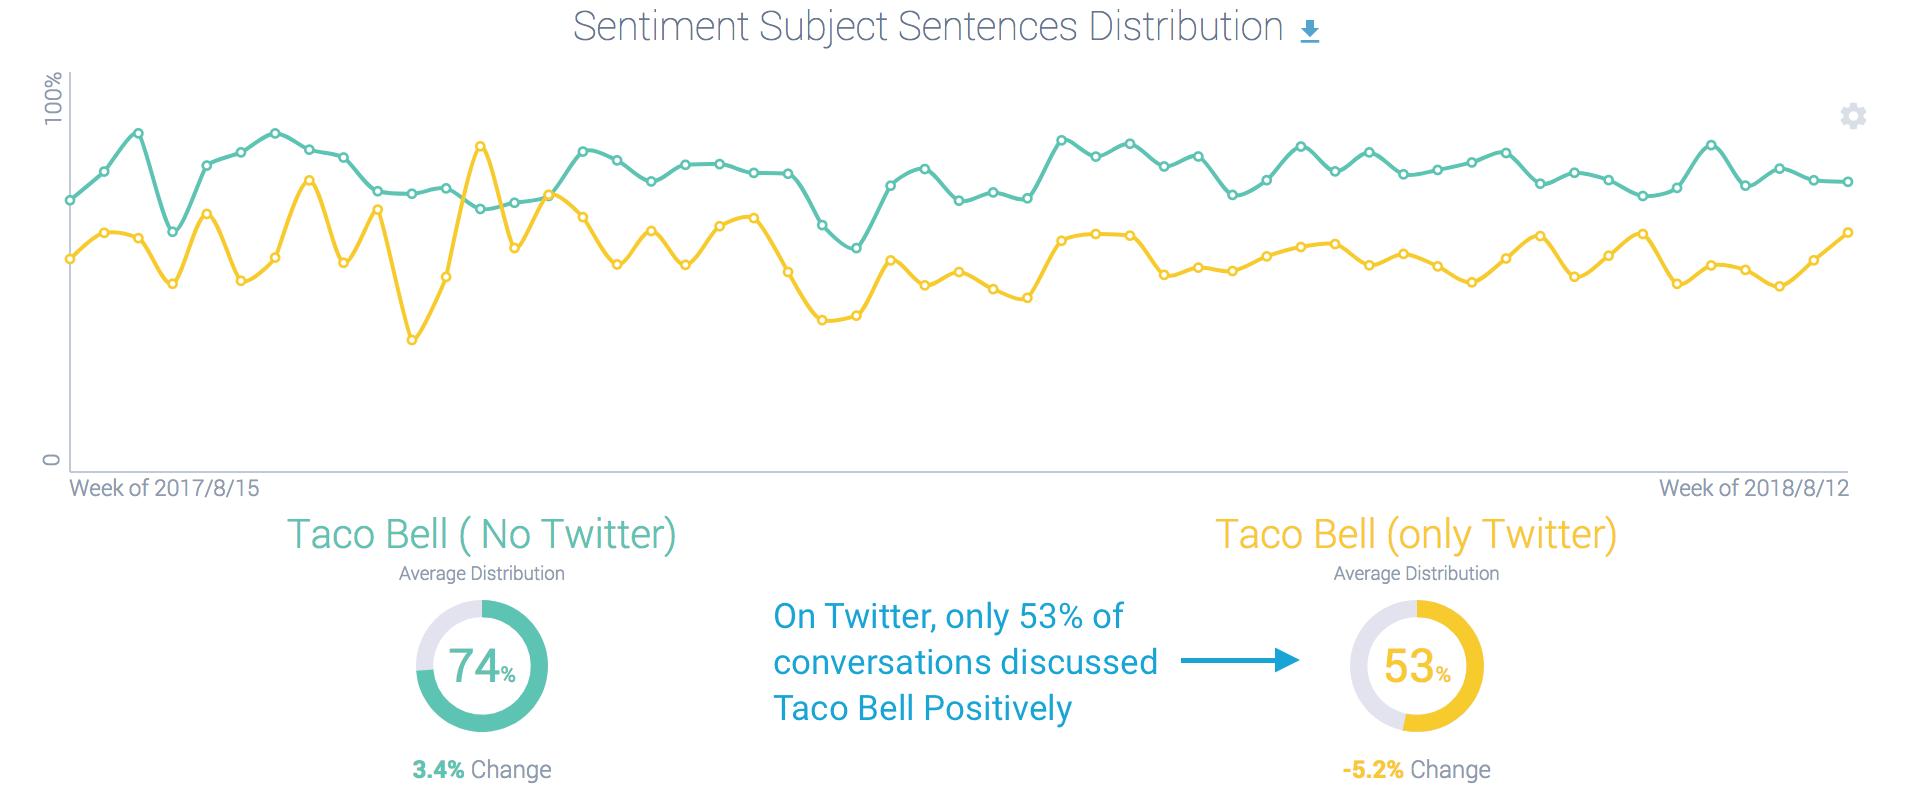 Taco Bell Sentiment NO TWITTER vs. ONLY TWITTER